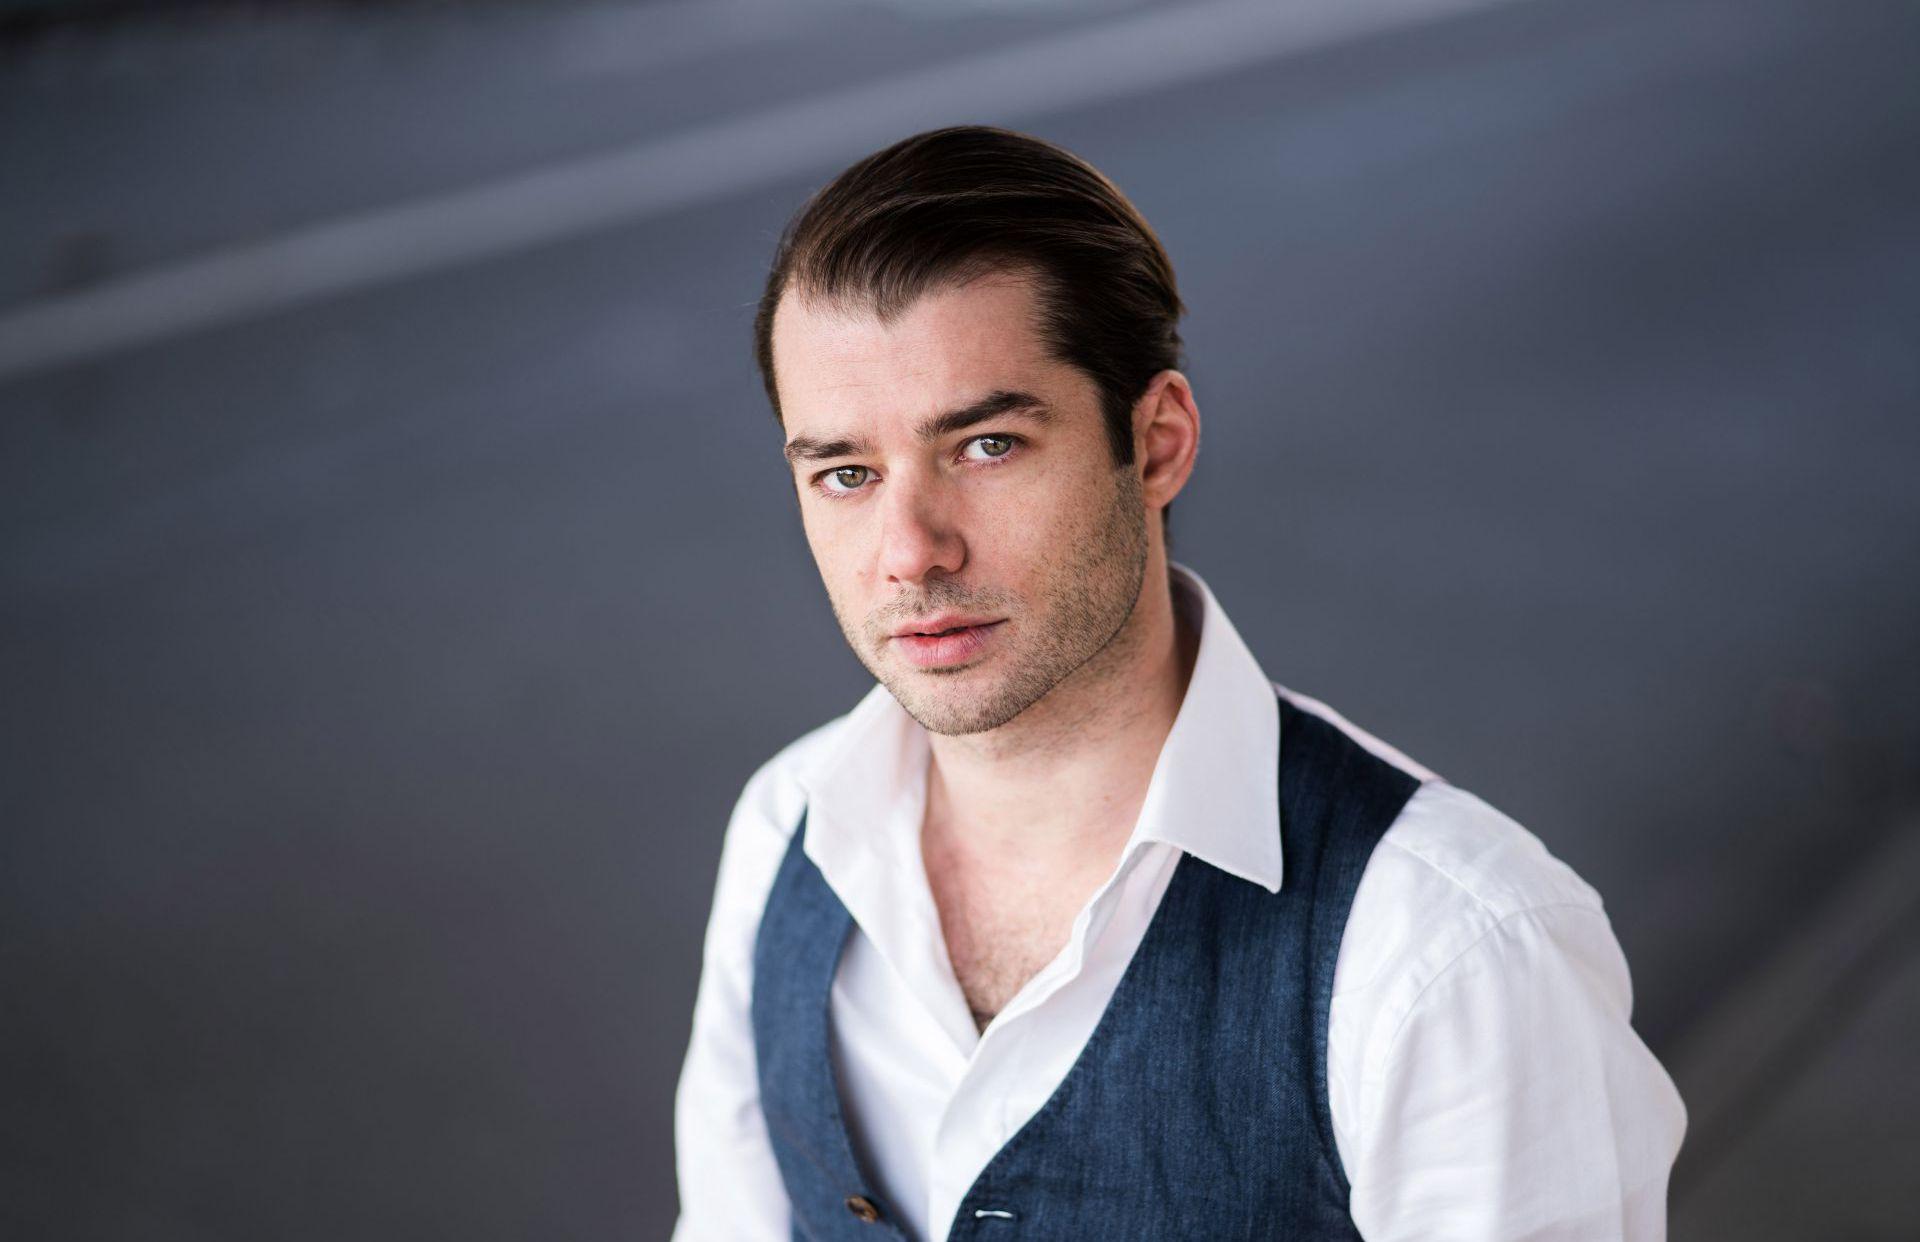 NICOLAS GARIN